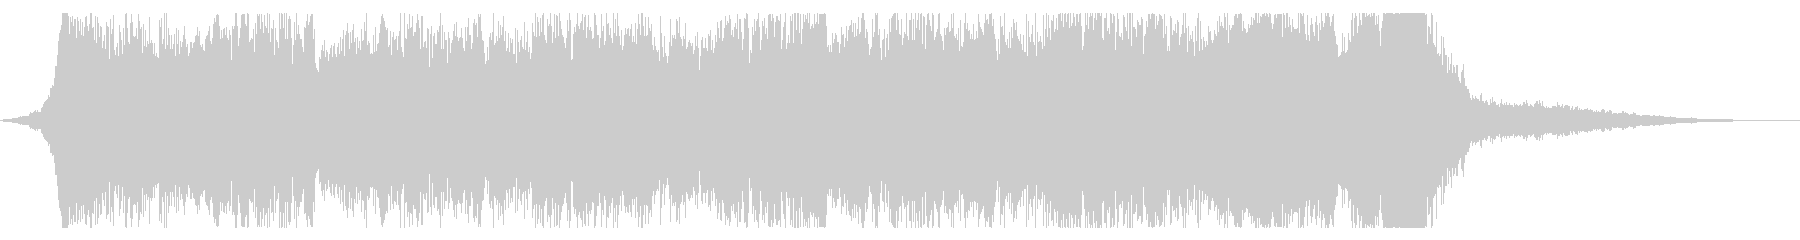 KANTホラー切迫感BGM200815の未再生の波形